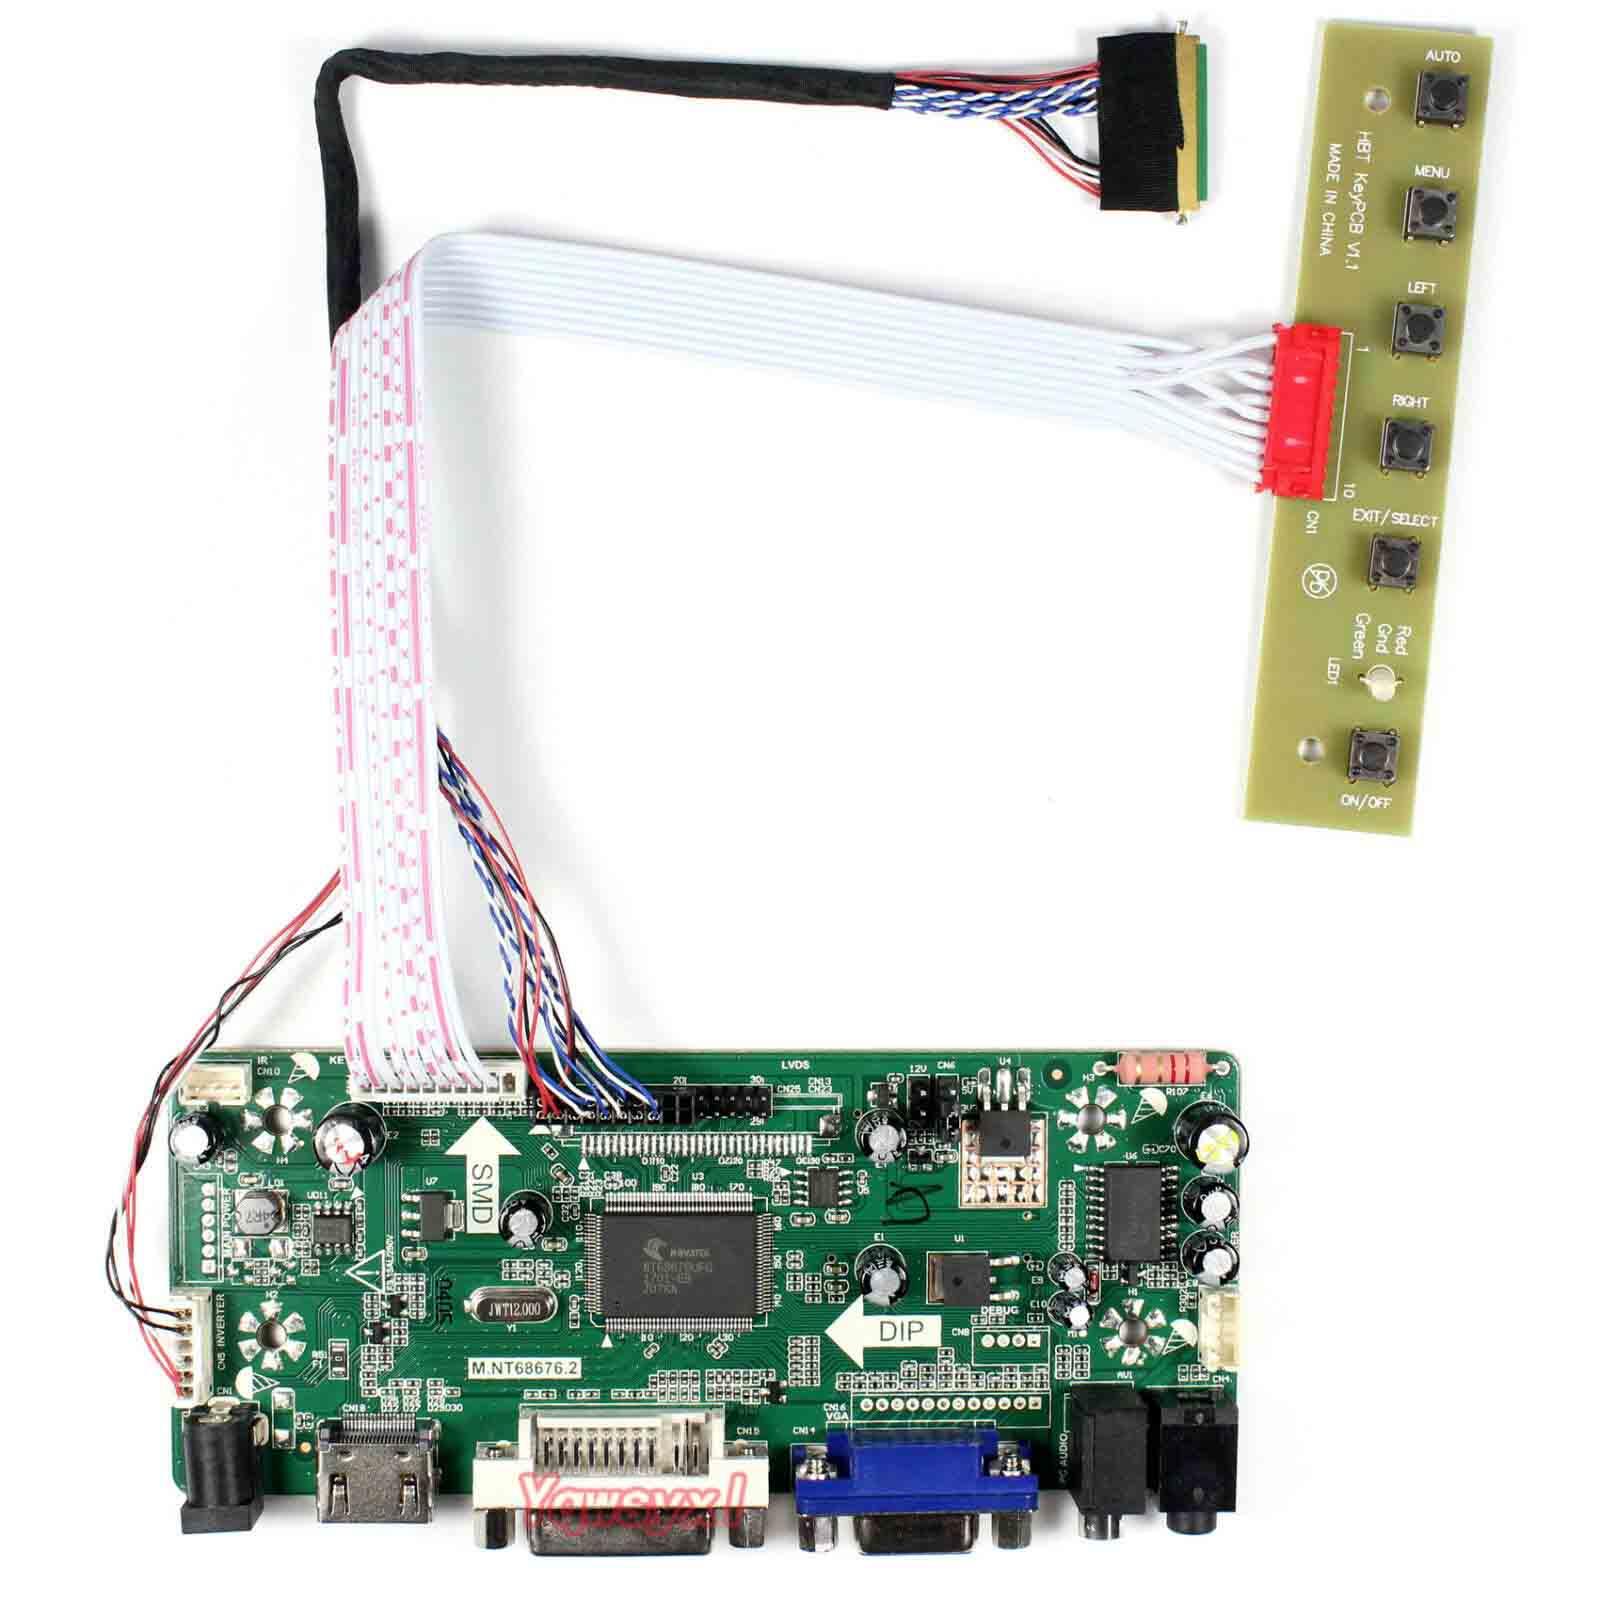 Yqwsyxl Control Board Monitor Kit For N101BGE-L31 HDMI+DVI+VGA LCD LED Screen  Controller Board Driver